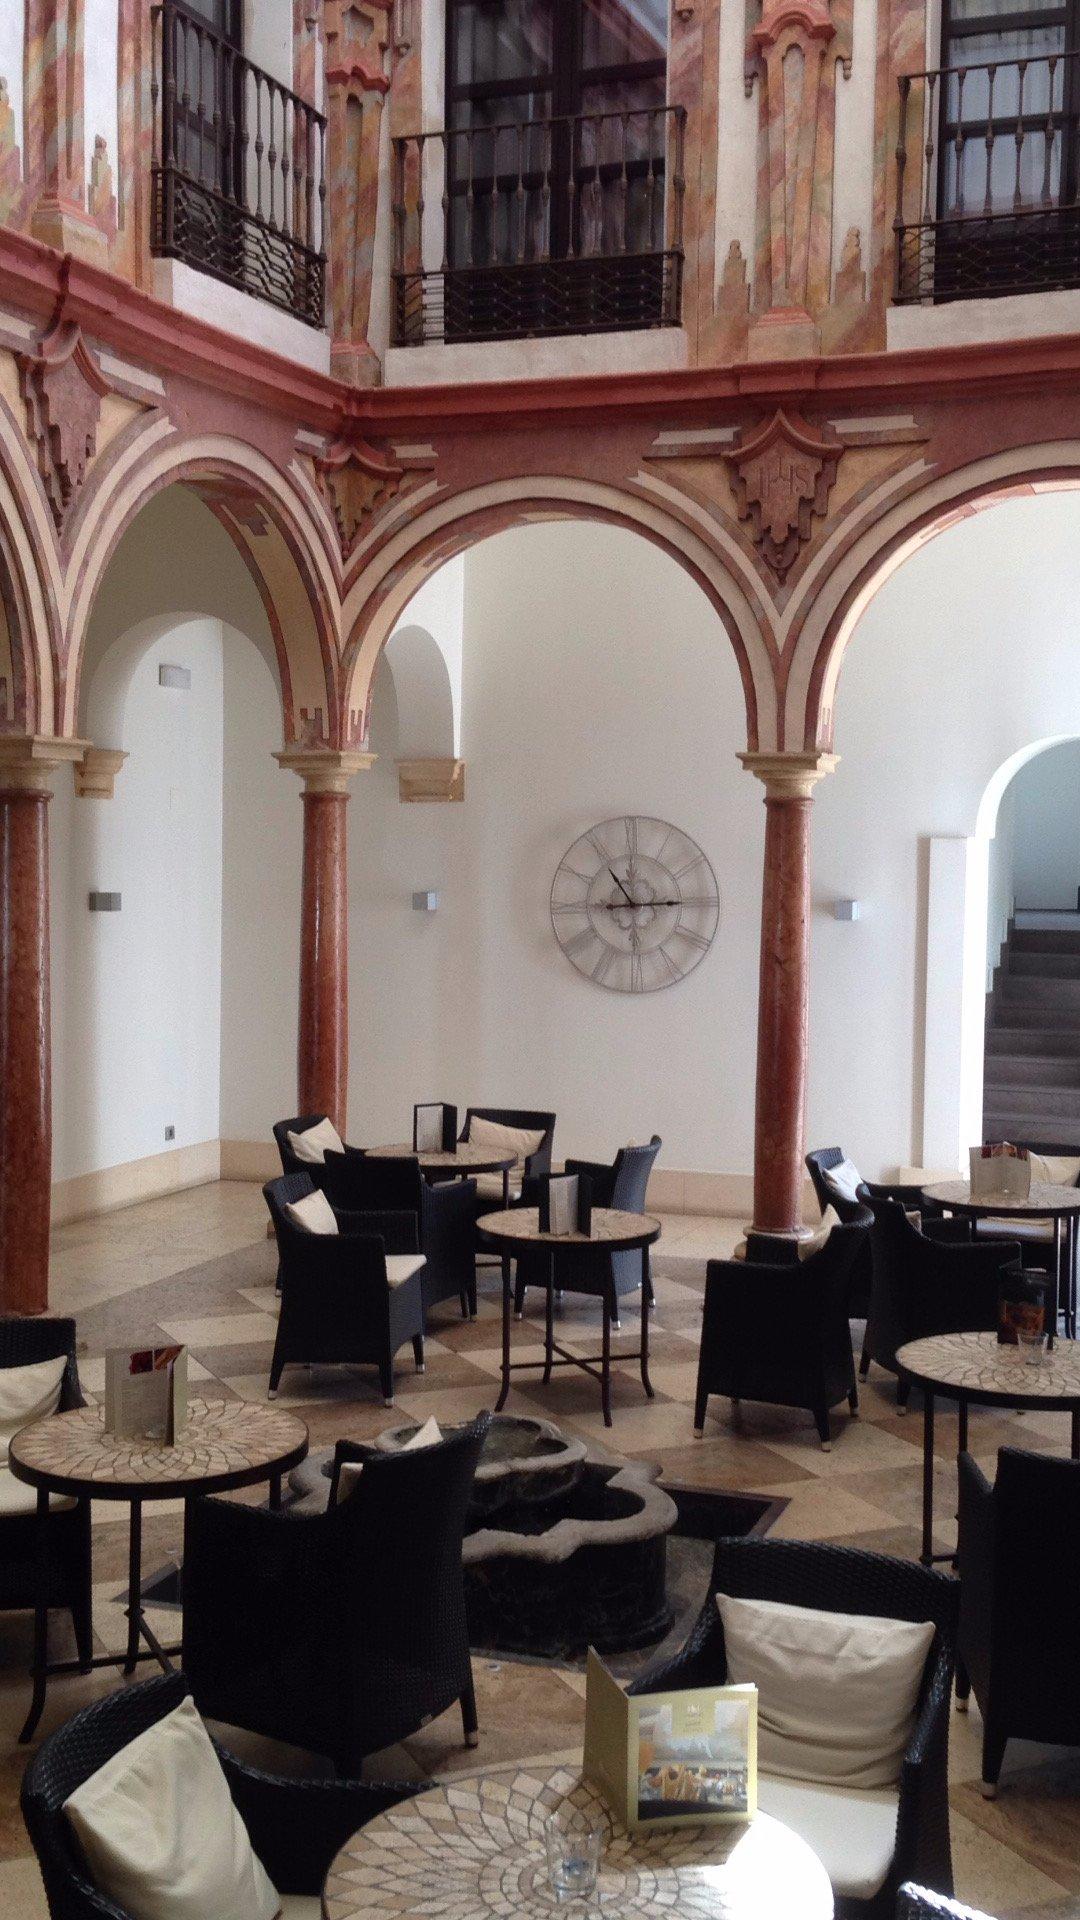 Eurostars Patios De Cordoba UPDATED 2018 Hotel Reviews Price